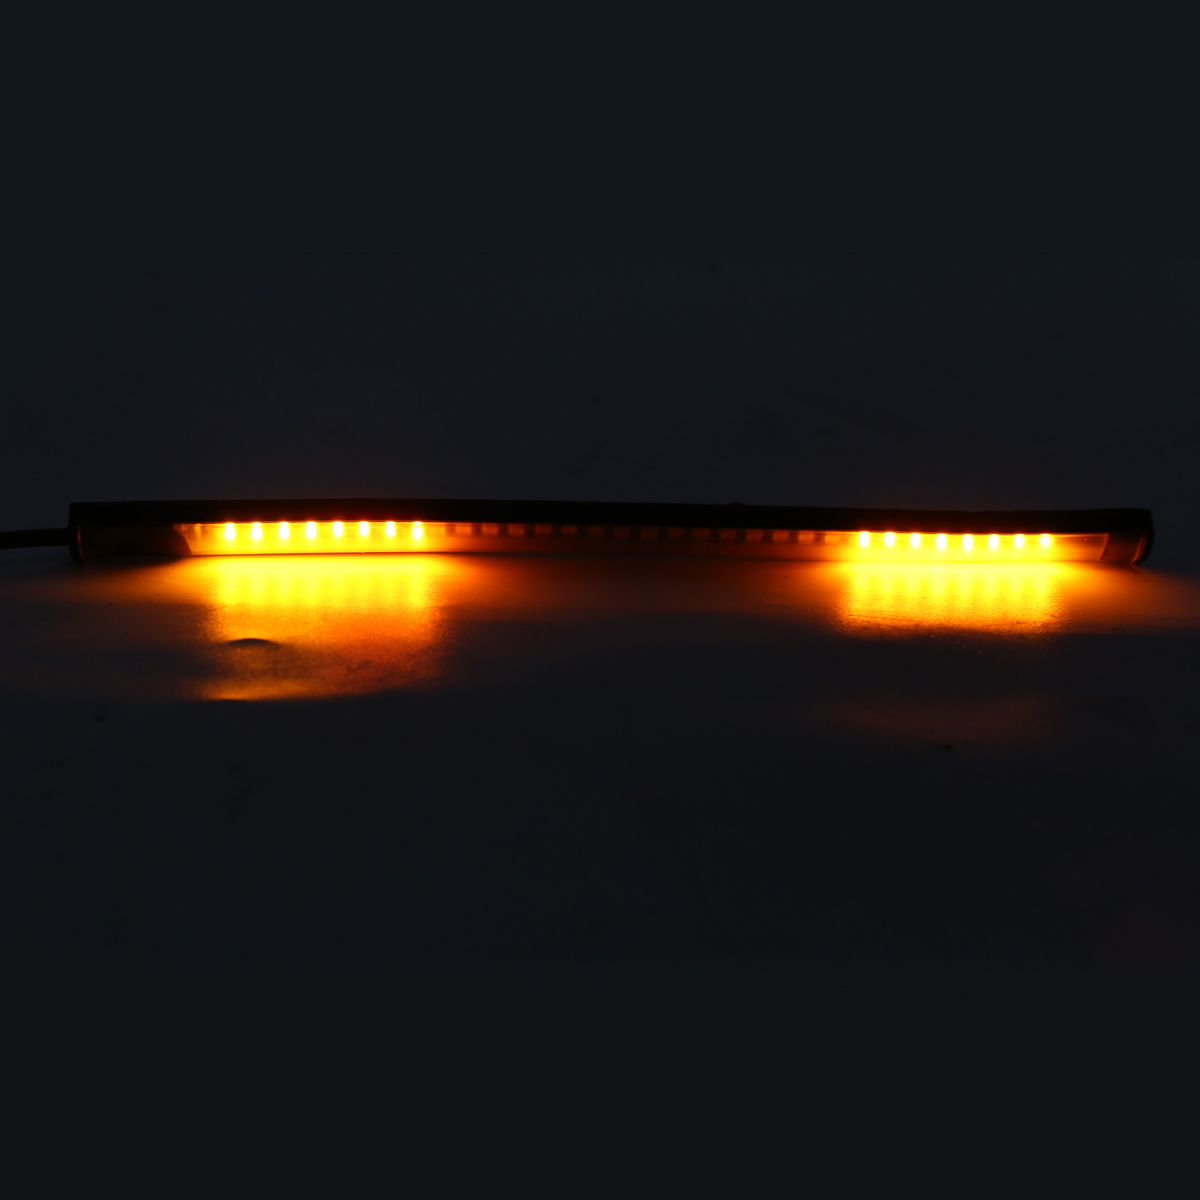 1PC DC 12V Flexible 48 LED SMD Strip Motorcycle Car Amber Turn Signal Light Red Brake Stop Light Lamp Super Bright 3528 LED